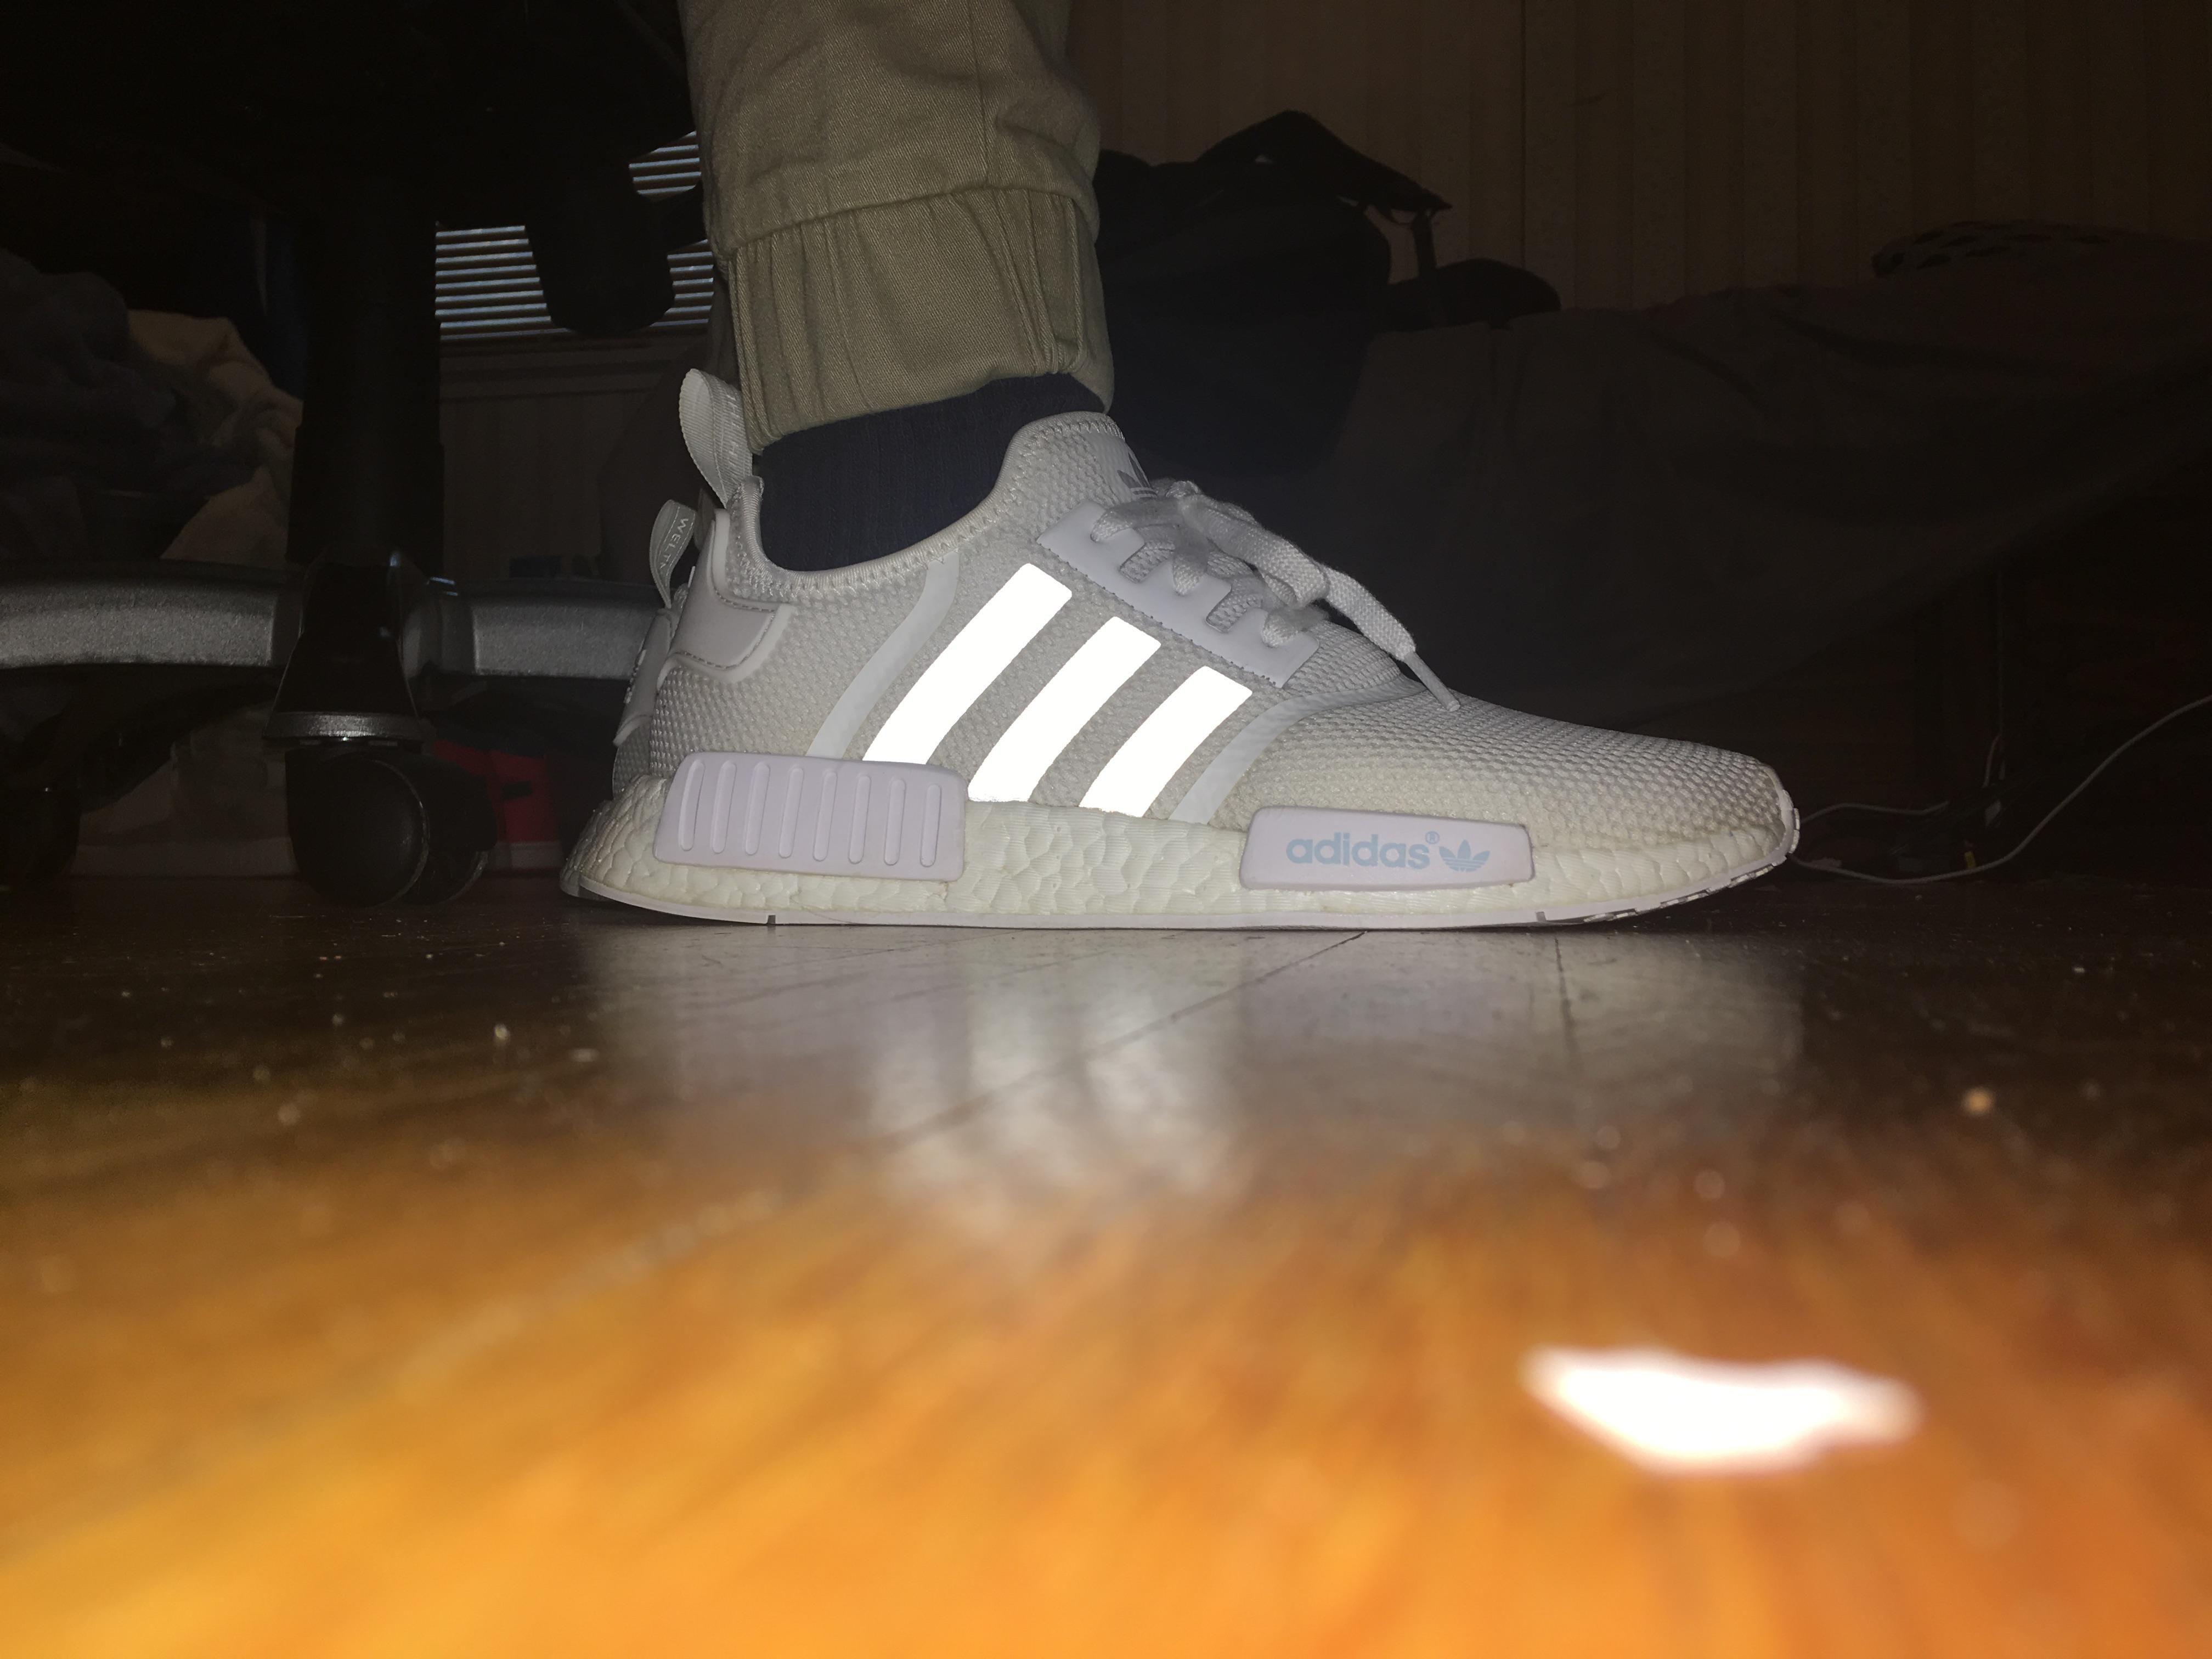 209fb698ea Pickup] First pair of NMDs : D | Nike Sneakers | Sneakers, Adidas ...